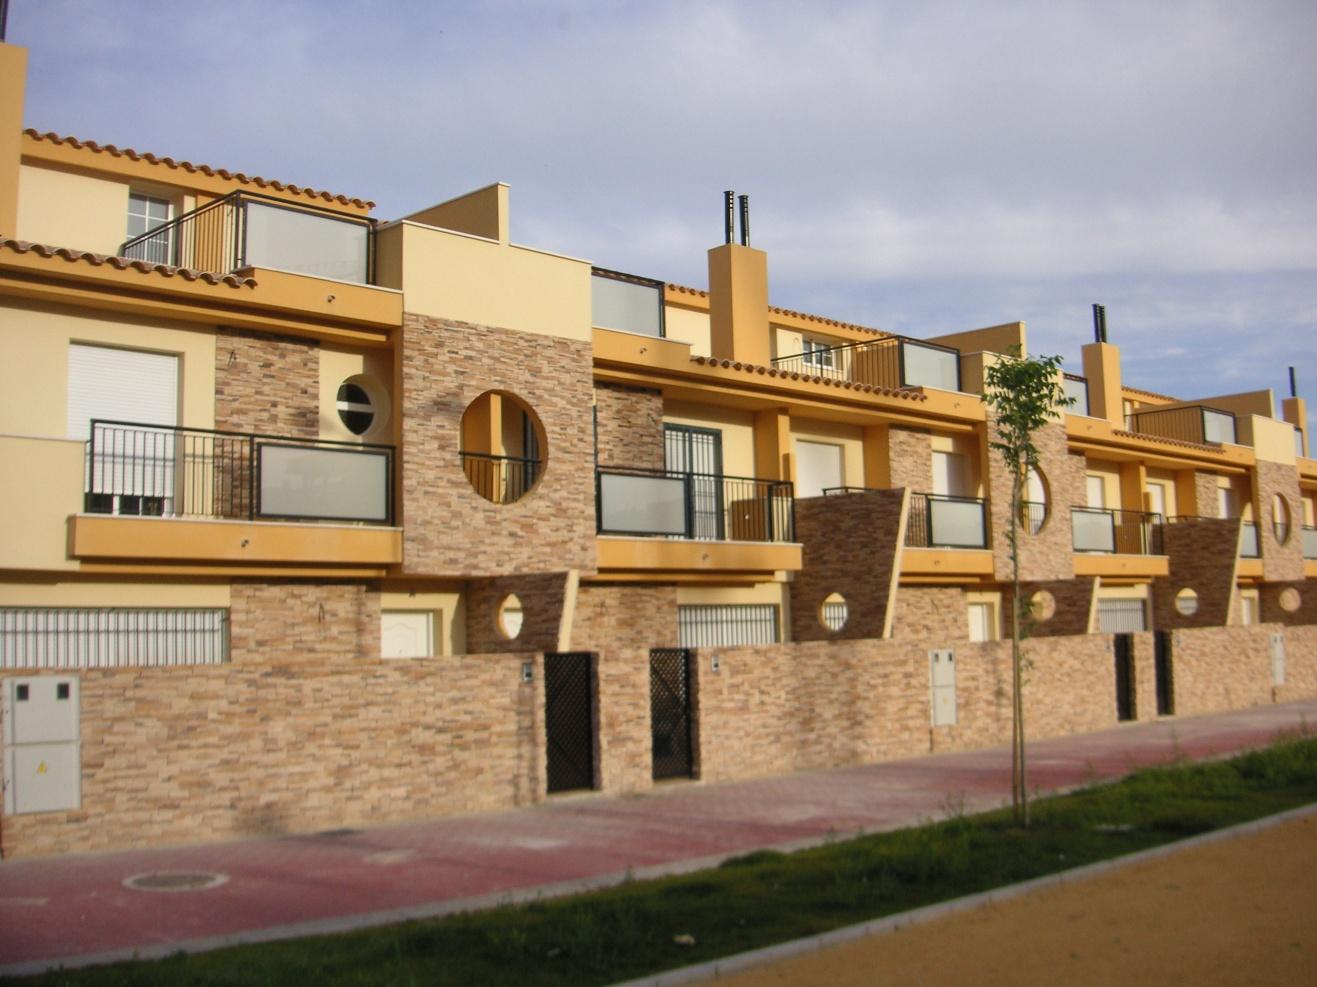 Abellan ingenieria y arquitectura residencial marina for Ingenieria y arquitectura